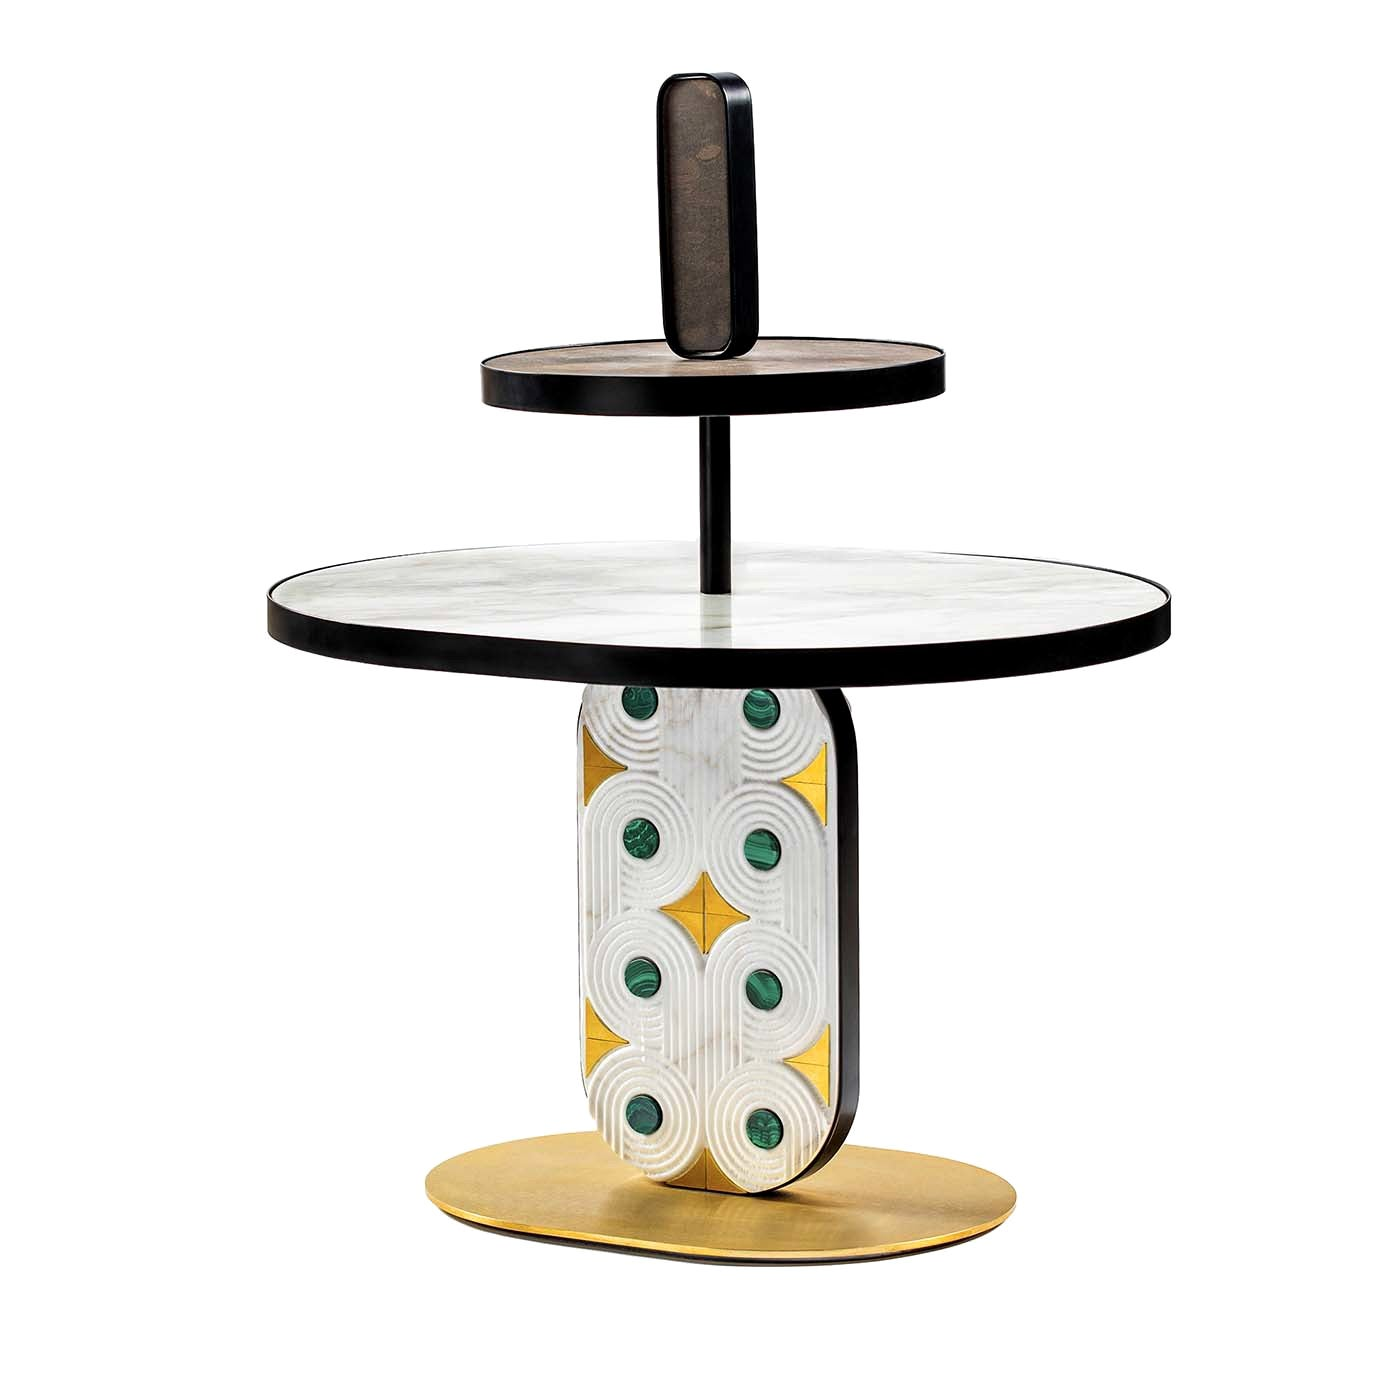 Calafato Side Table by Elena Salmistraro